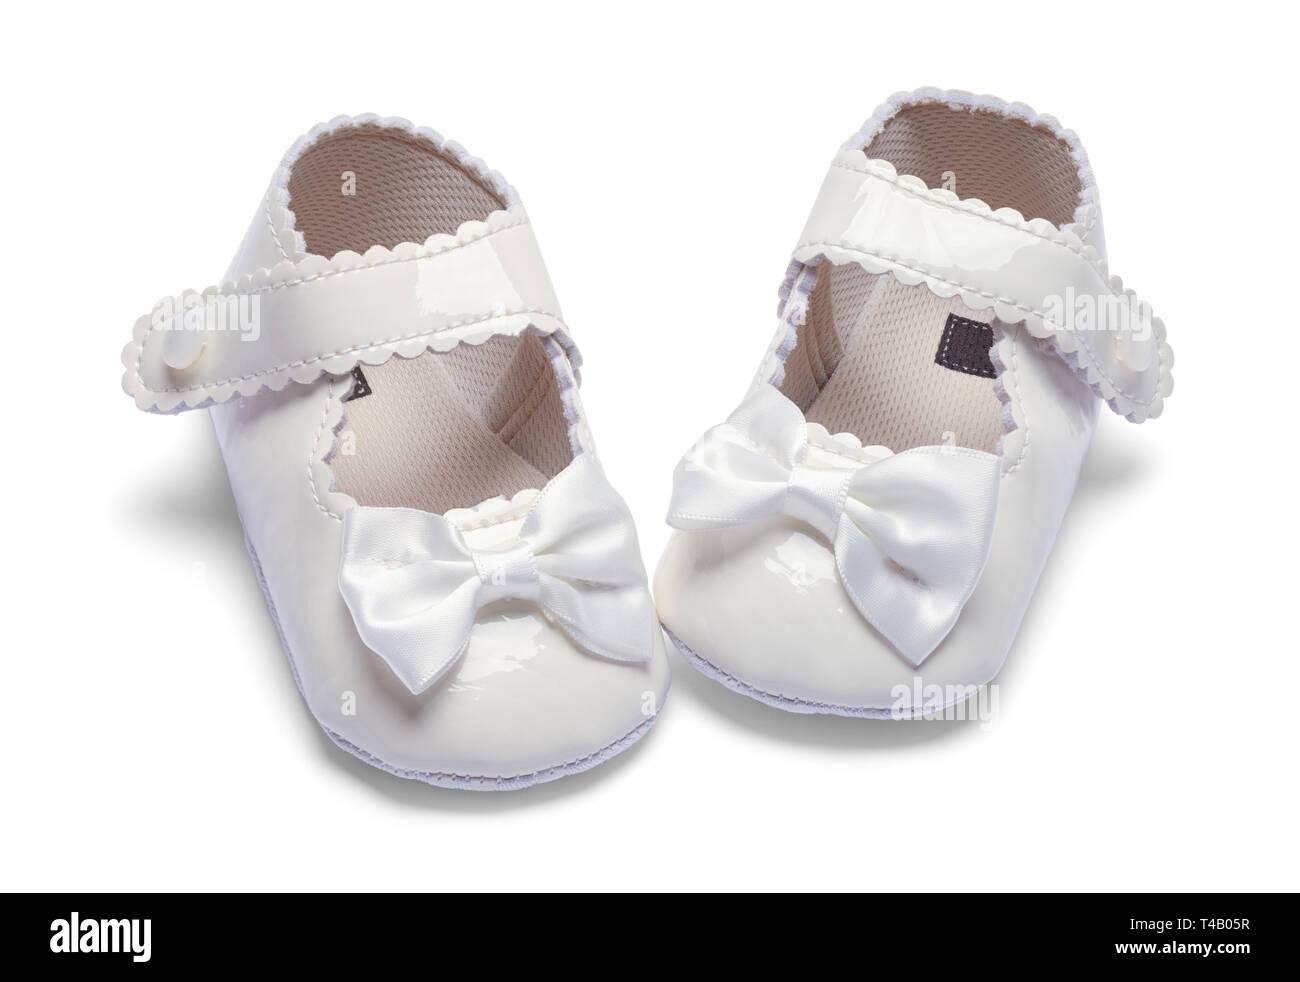 Girls Baby Dress Shoes Pointed Inward Isolated on White. - Stock Image